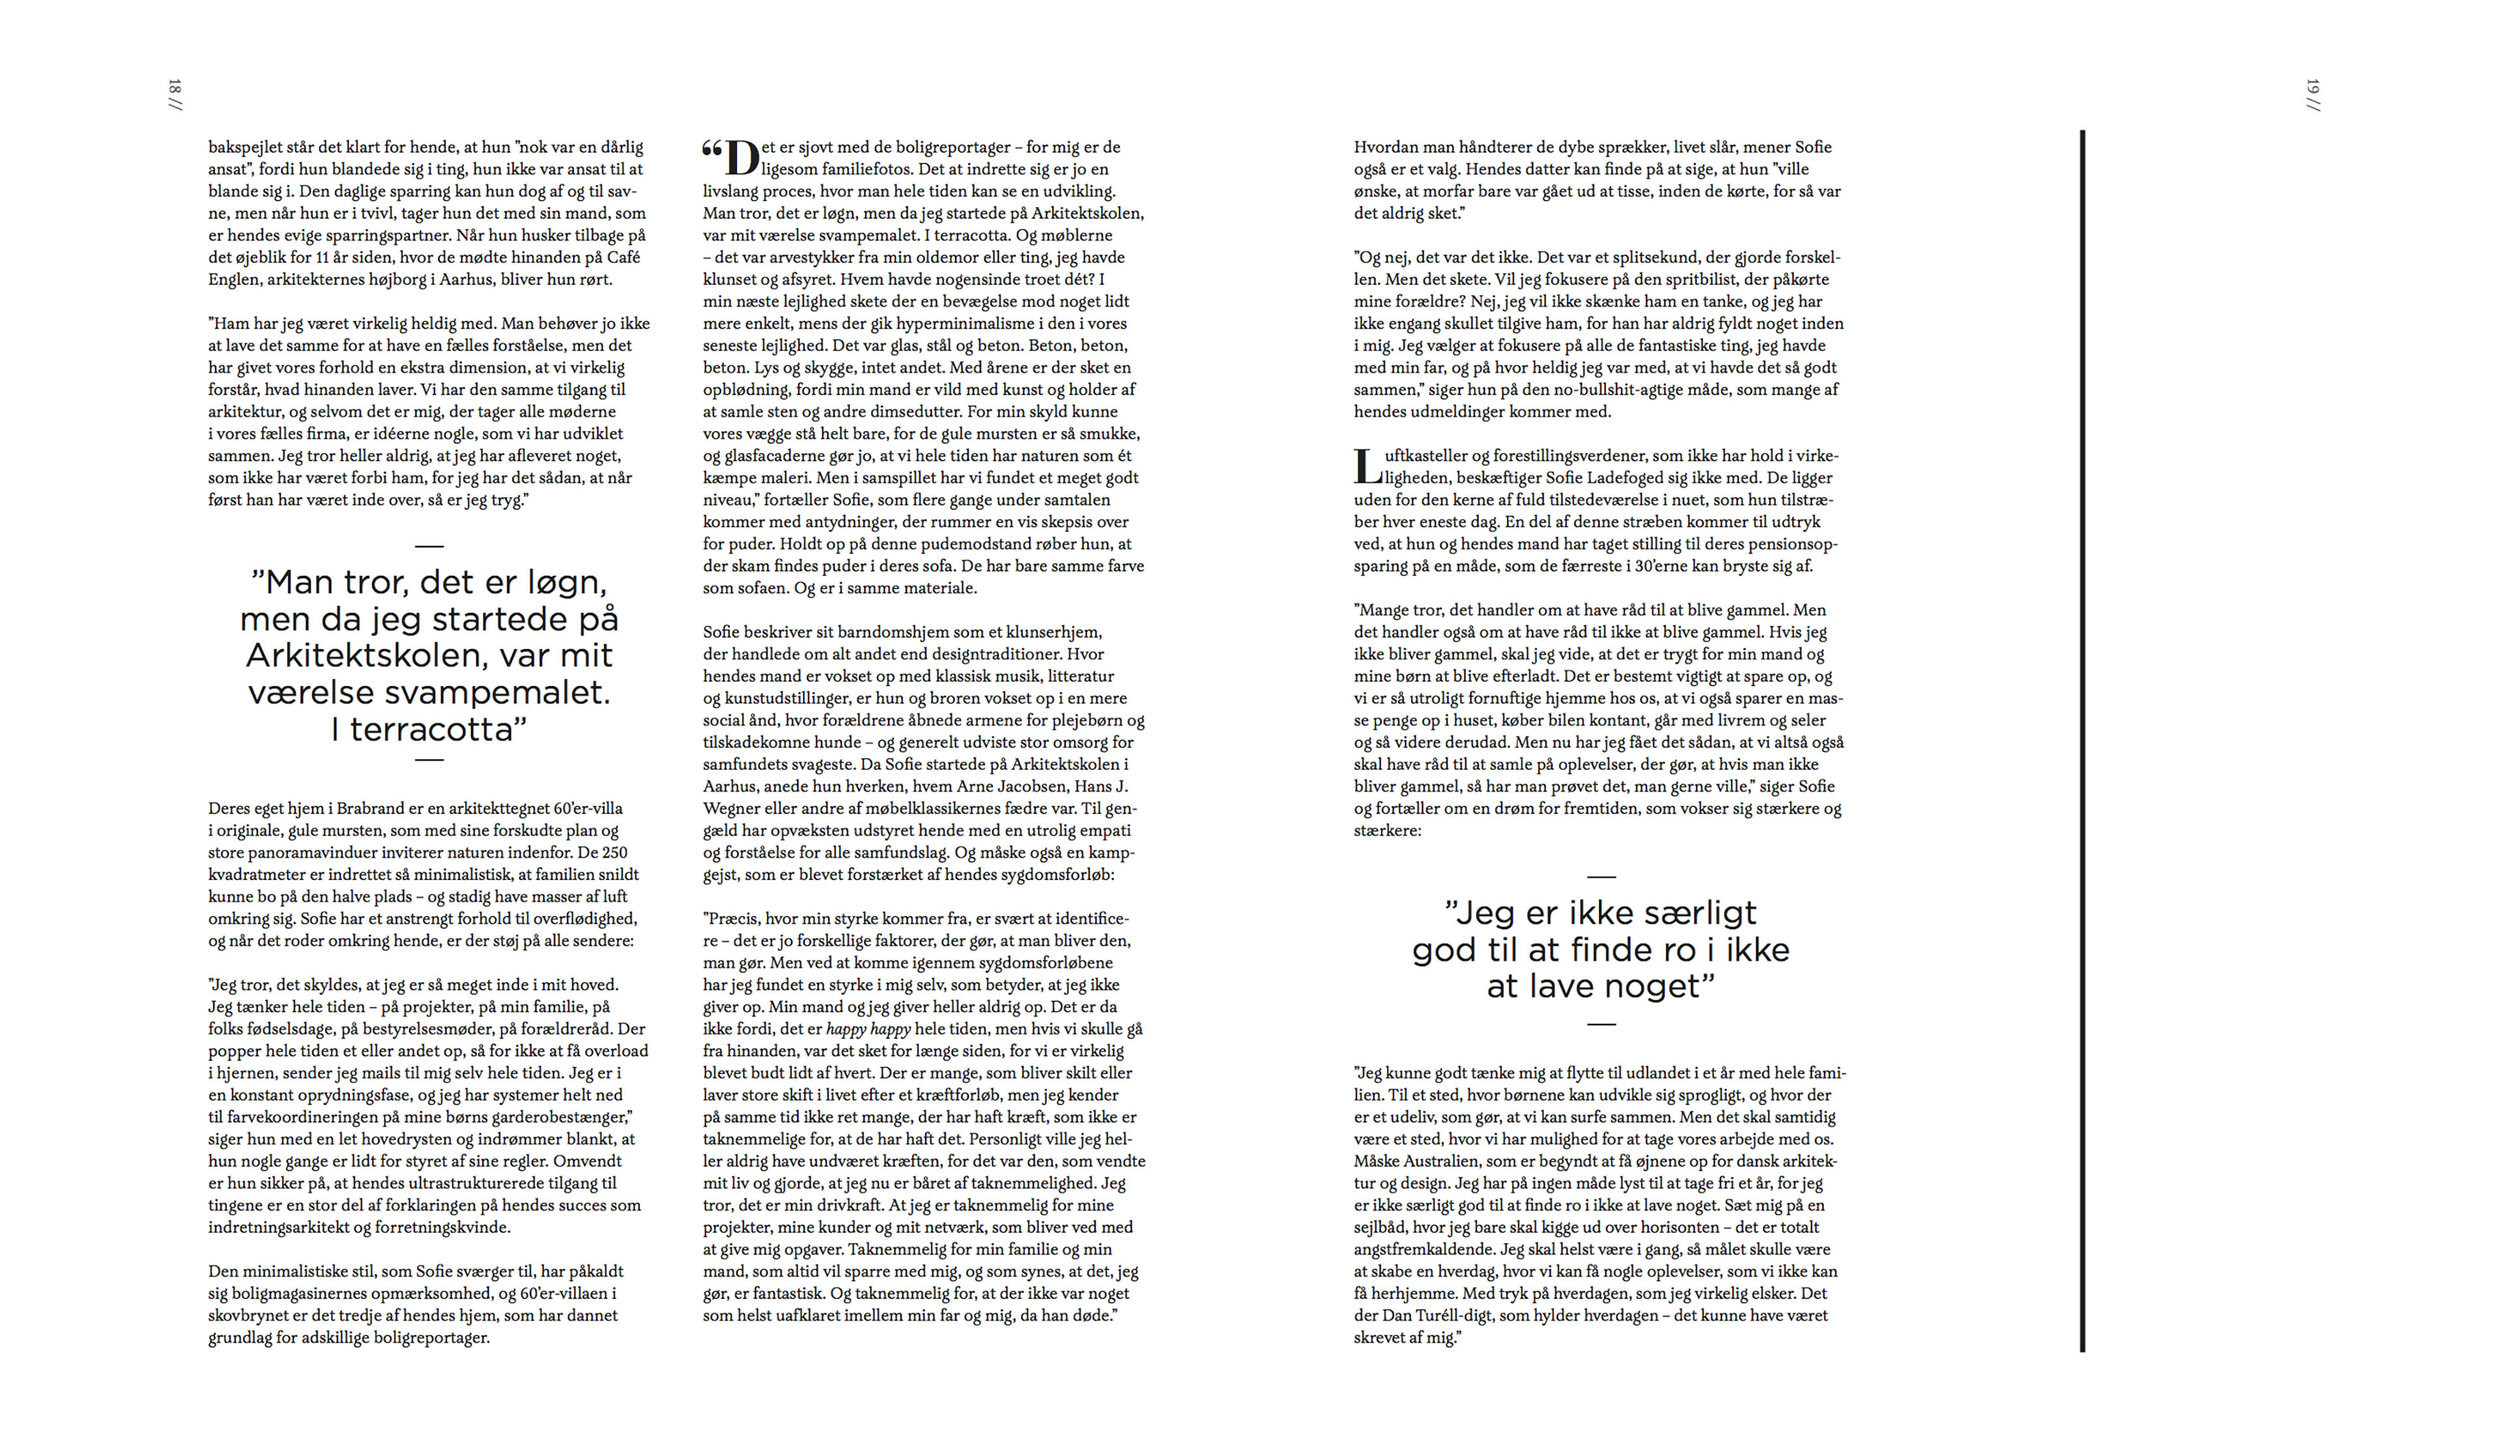 sofie-ladefoged-press-note-magazine-2014-page-04.jpg